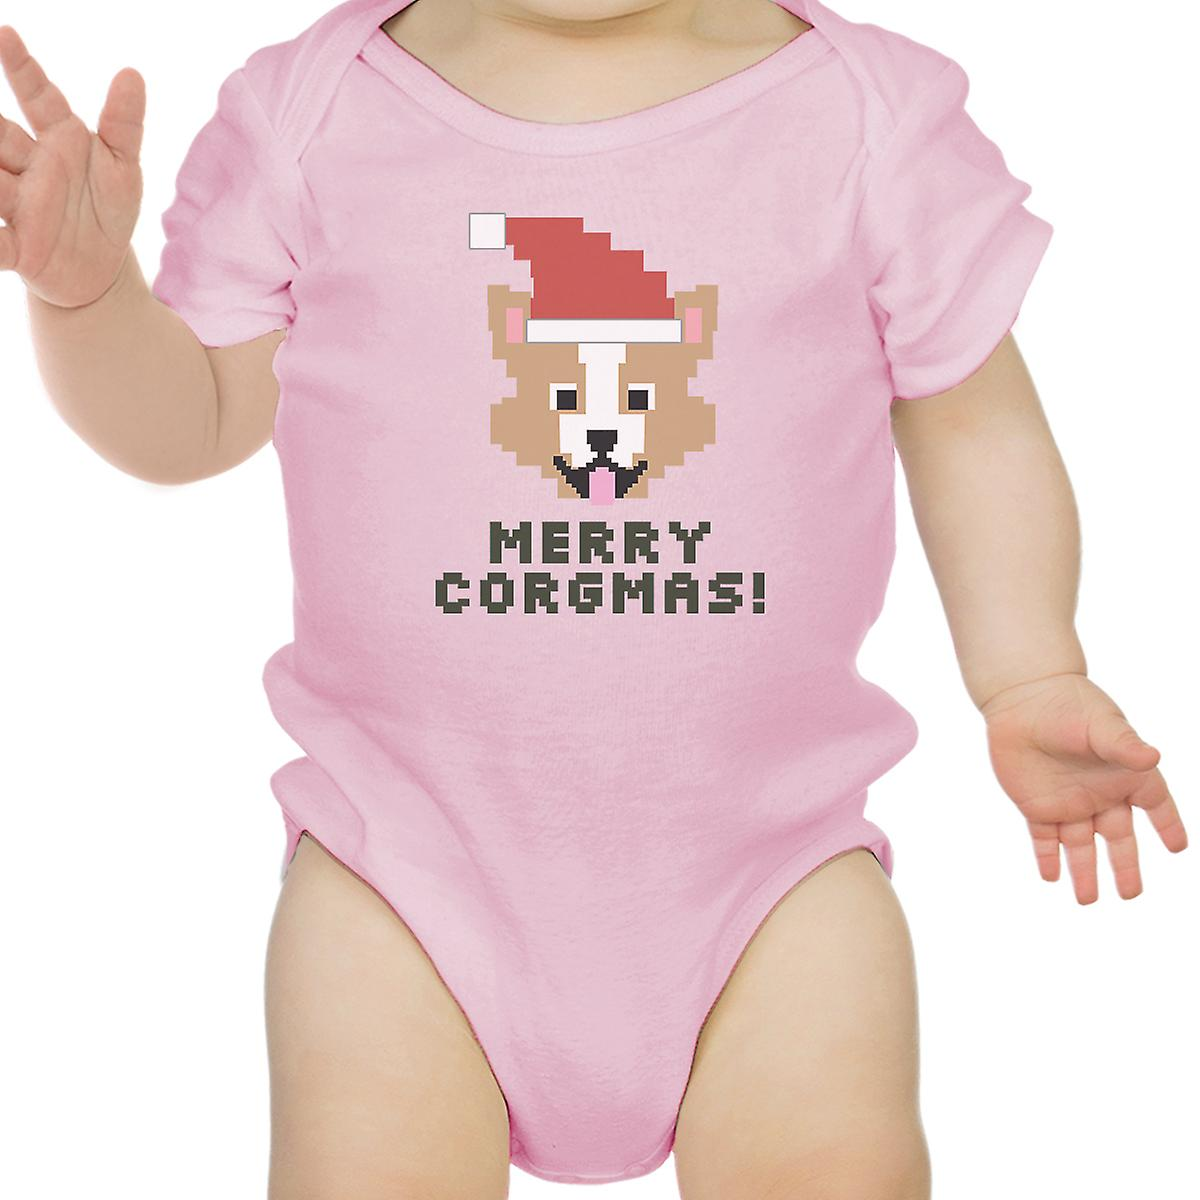 9e8e42f60d05 Merry Corgmas Corgi Pink Baby Bodysuit Cute Christmas Baby Gift Idea ...